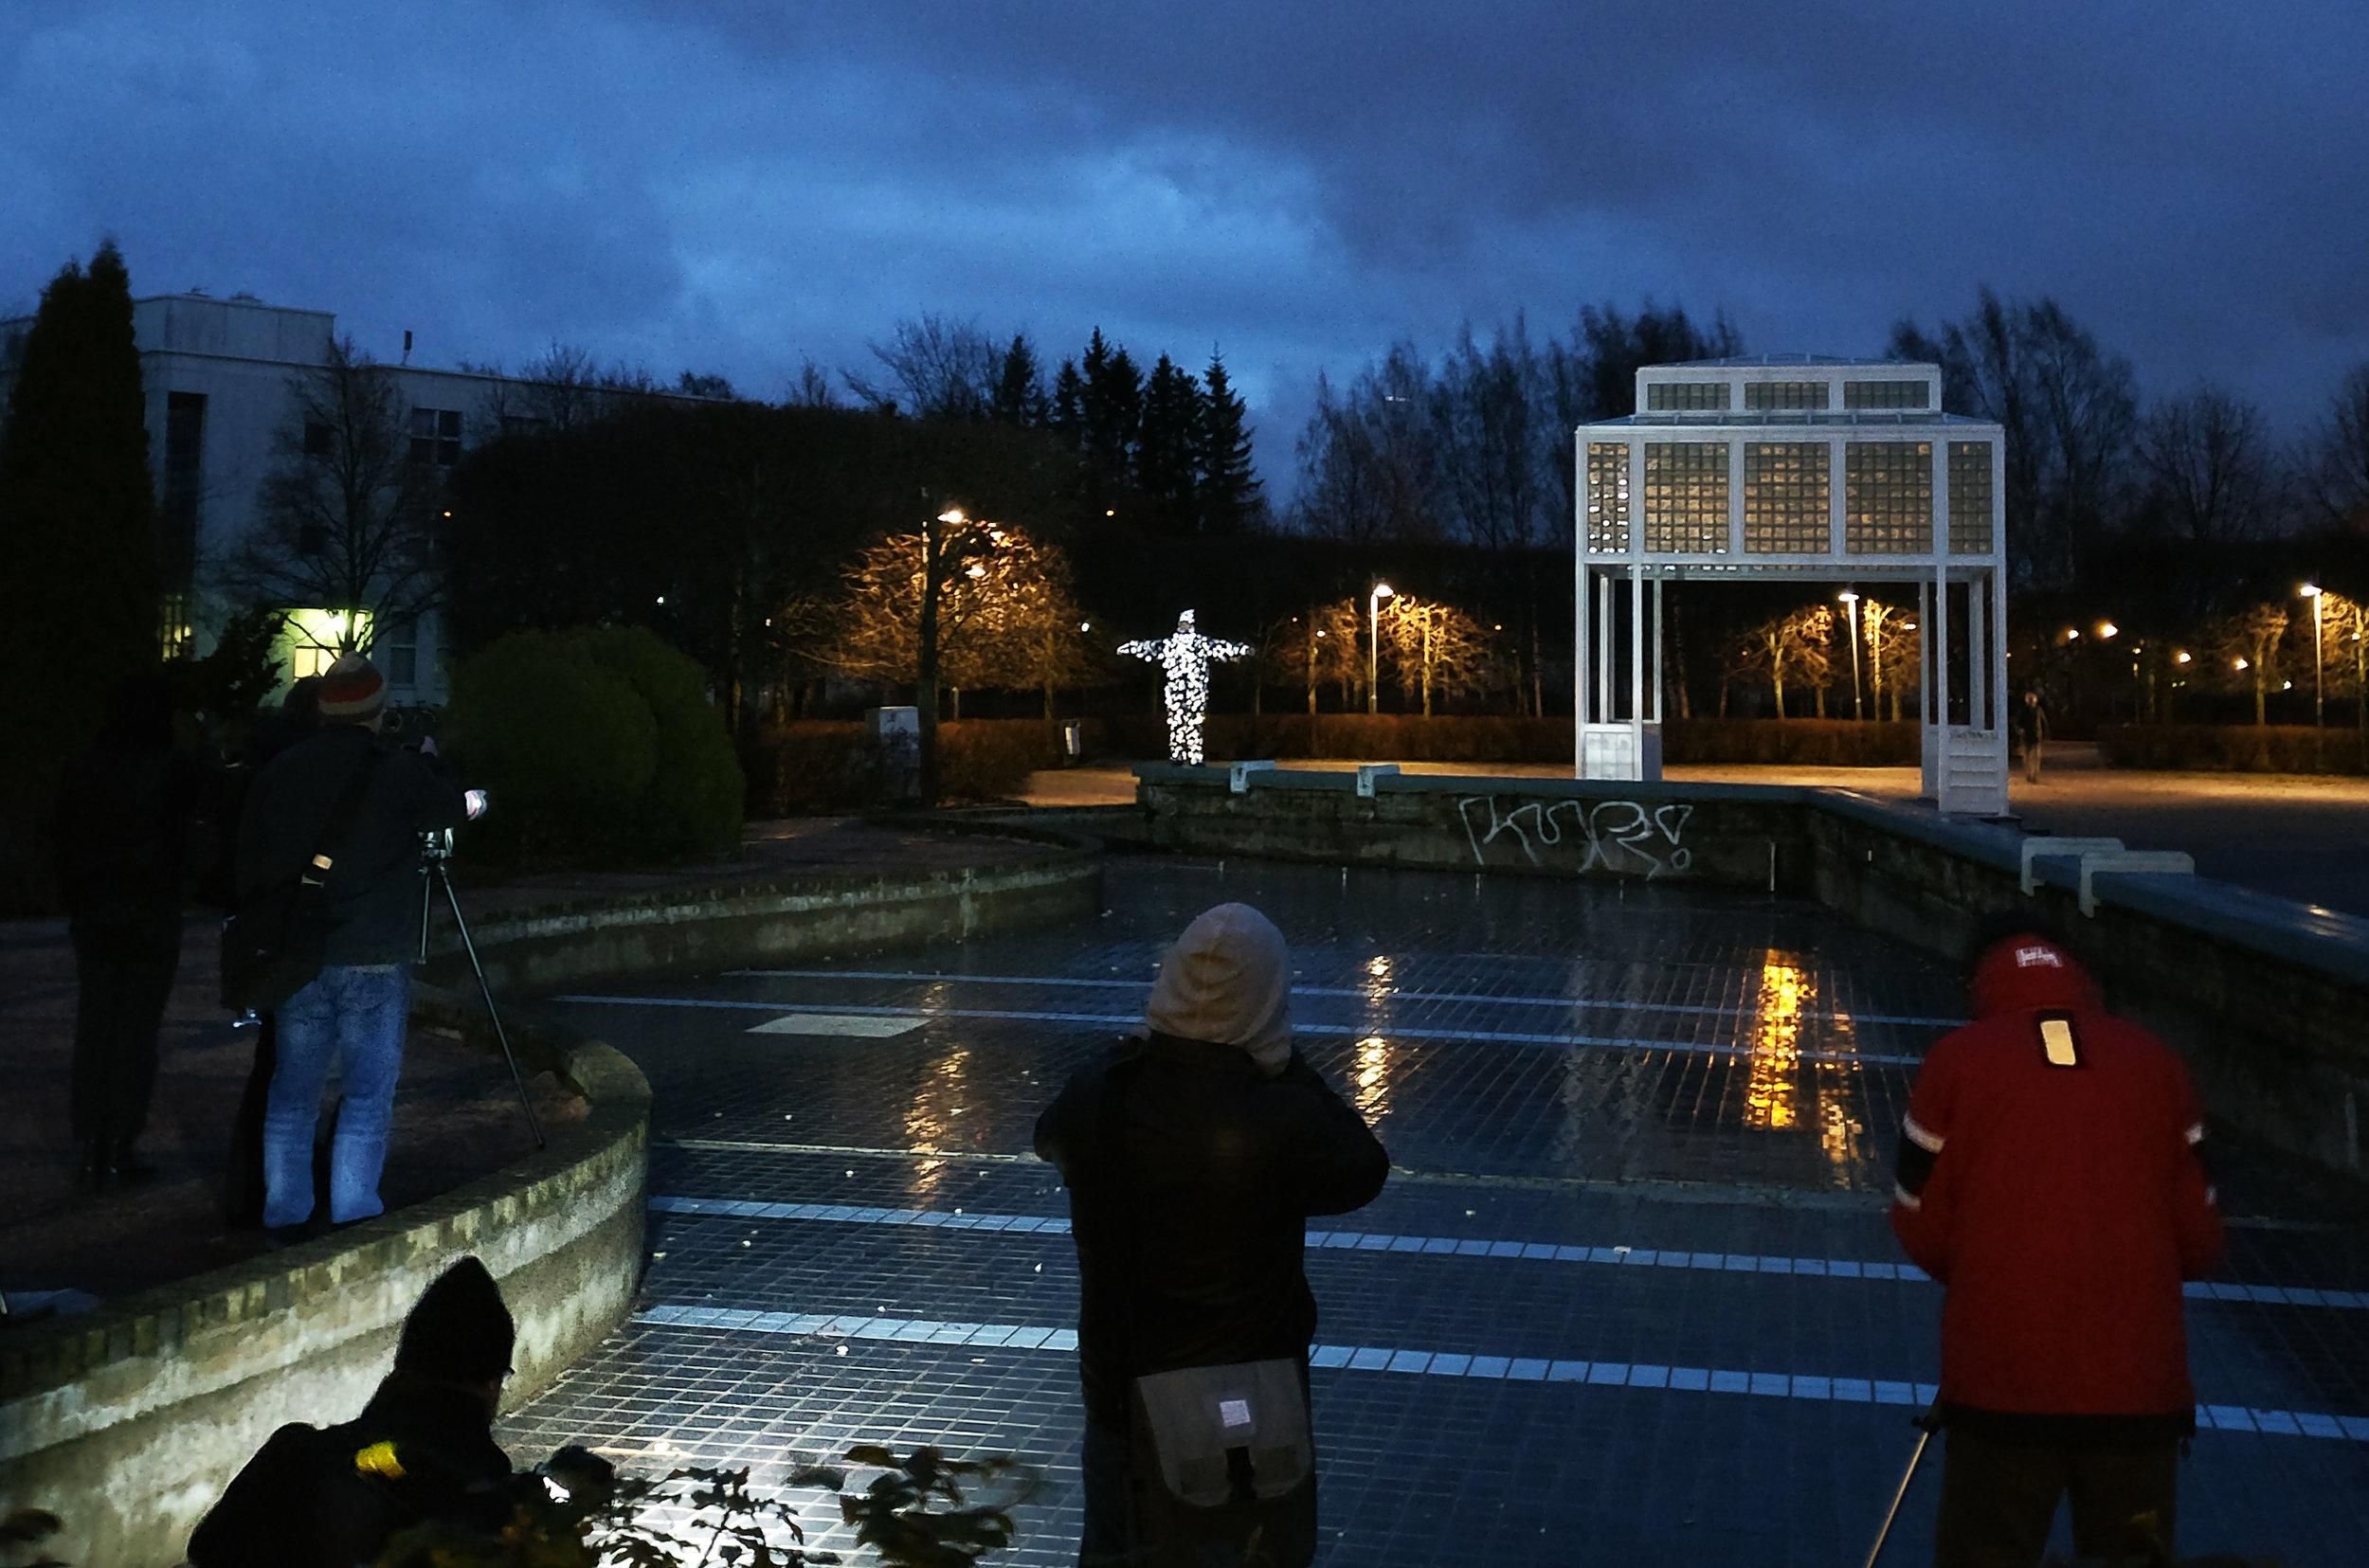 Talvi 2017: Heijastusmies poseerasi Valotila -kubilaisille